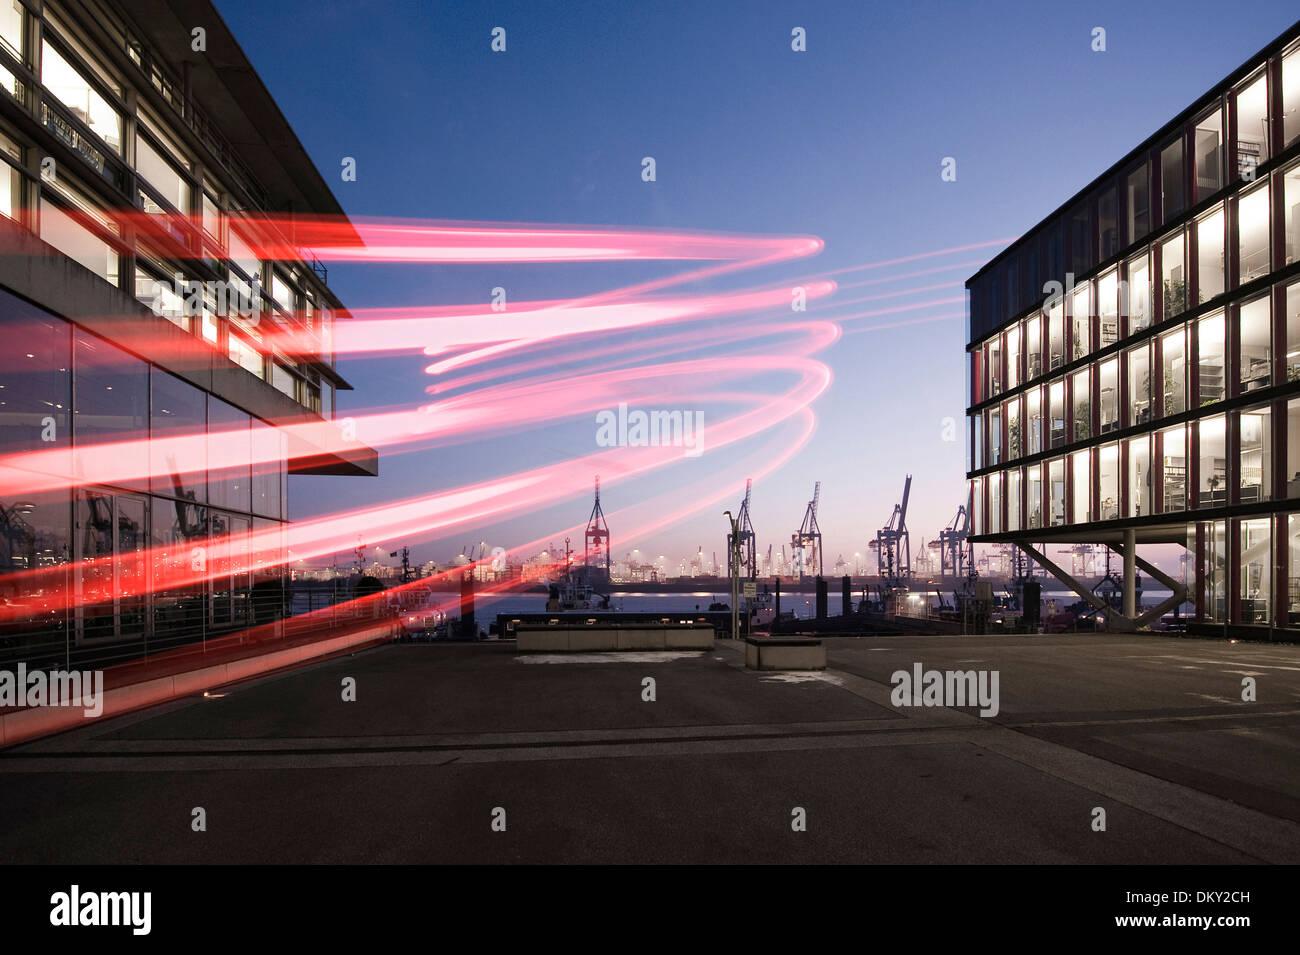 Neumühlen, modern office buildings, harbor cranes in the evening, Hamburg, Germany, Europe - Stock Image